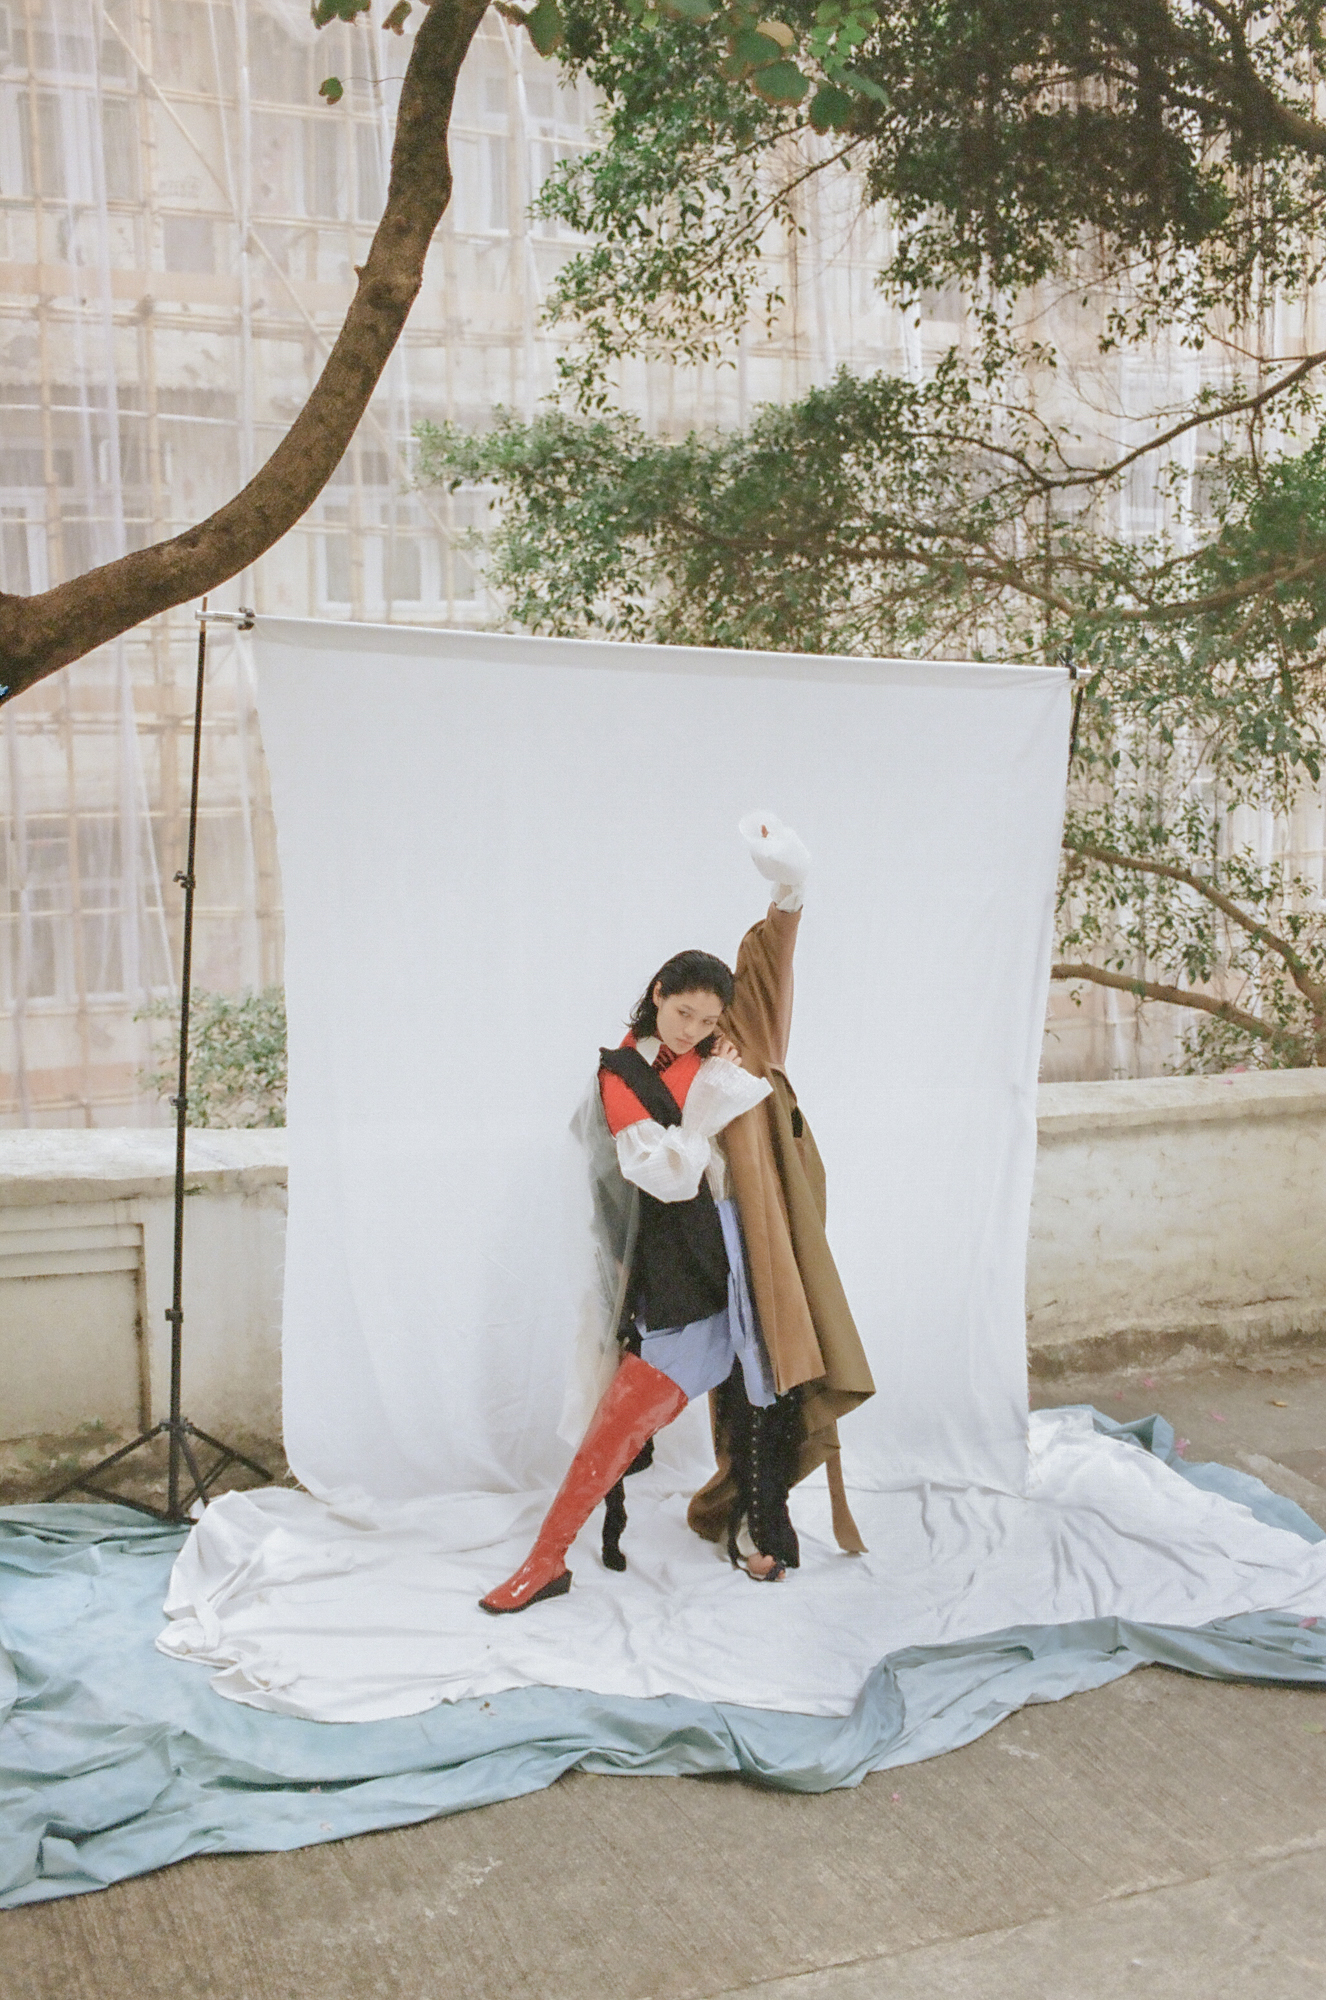 On Jennifer - Photographer & Art director